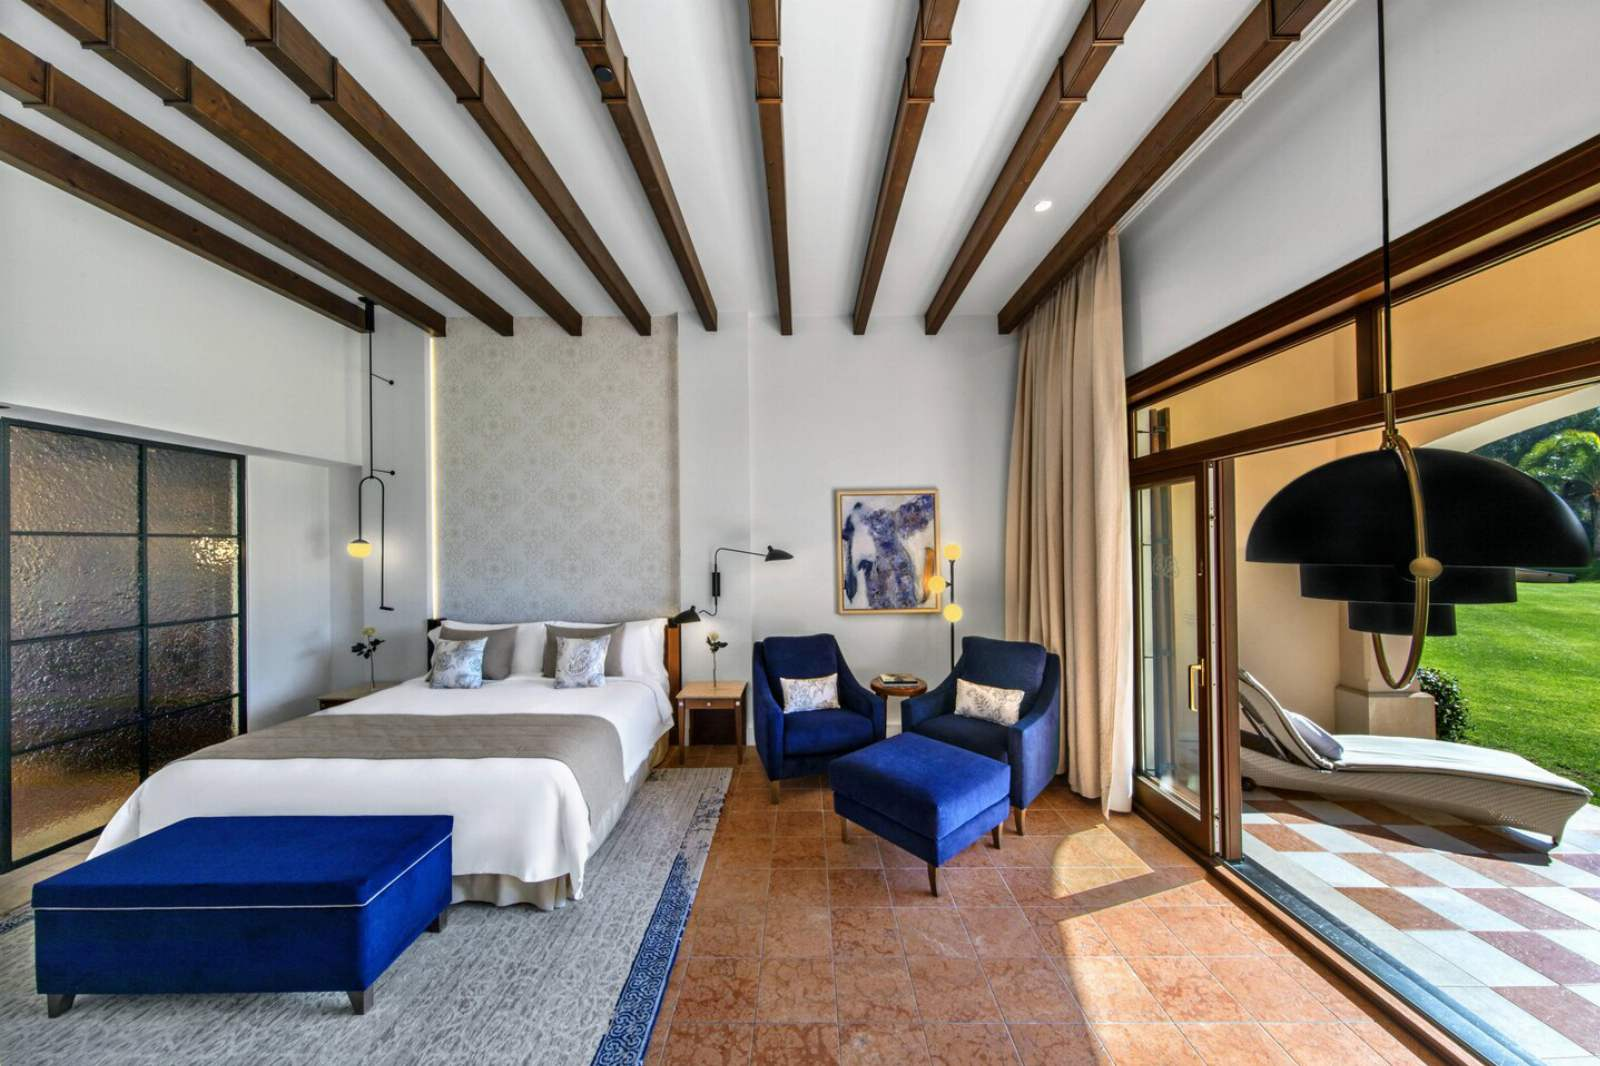 St. Regis Mardavall Resort - Grand Deluxe Room, Garden Access